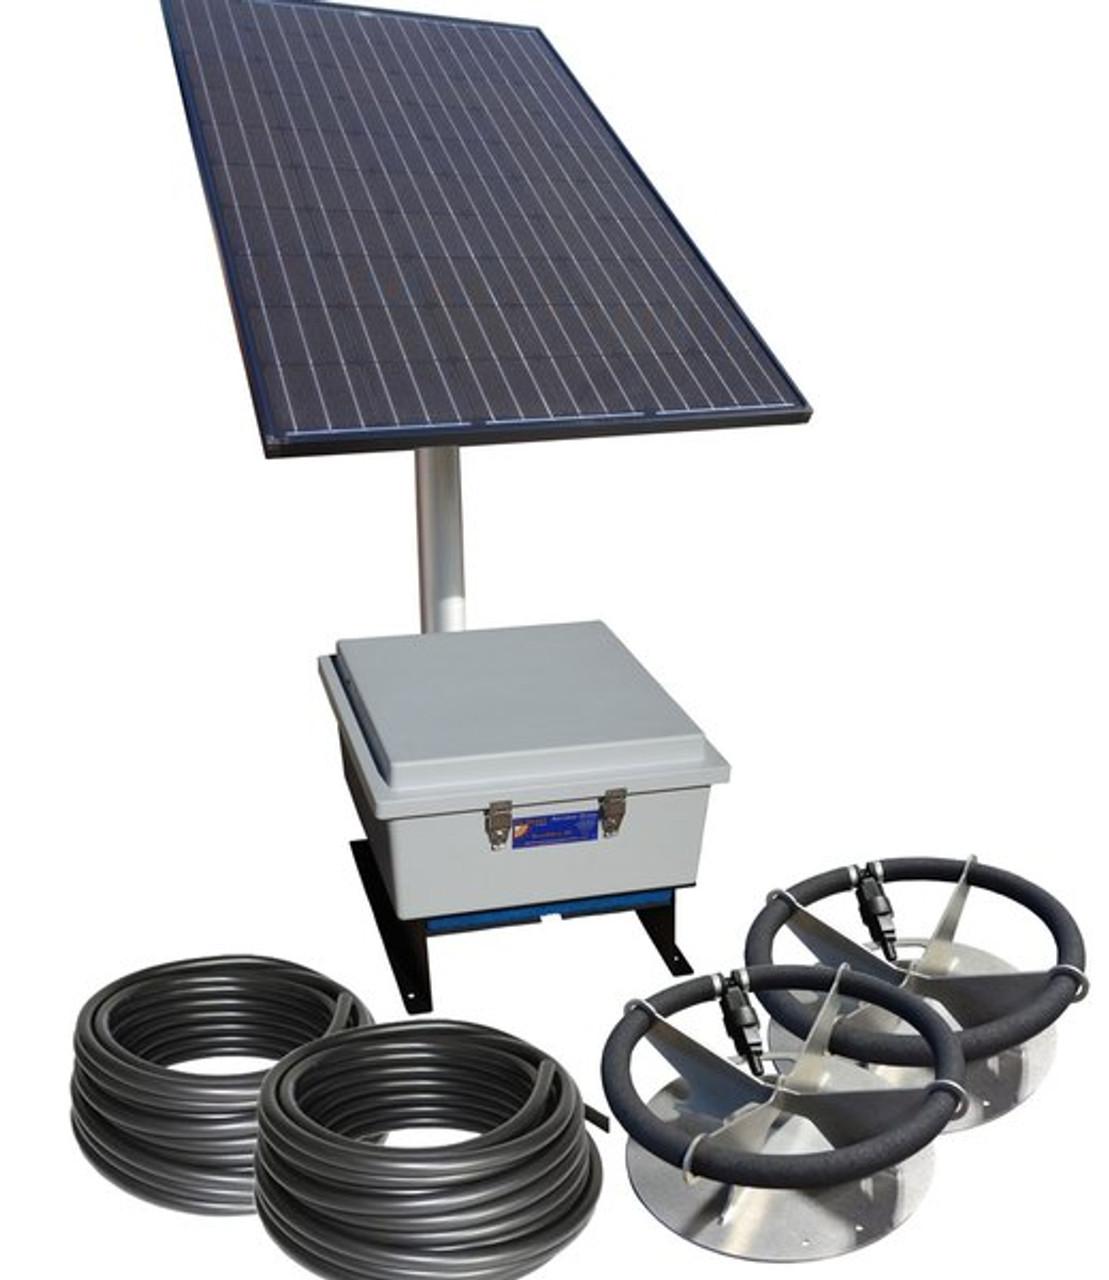 SLA-SD2-BLDC Package